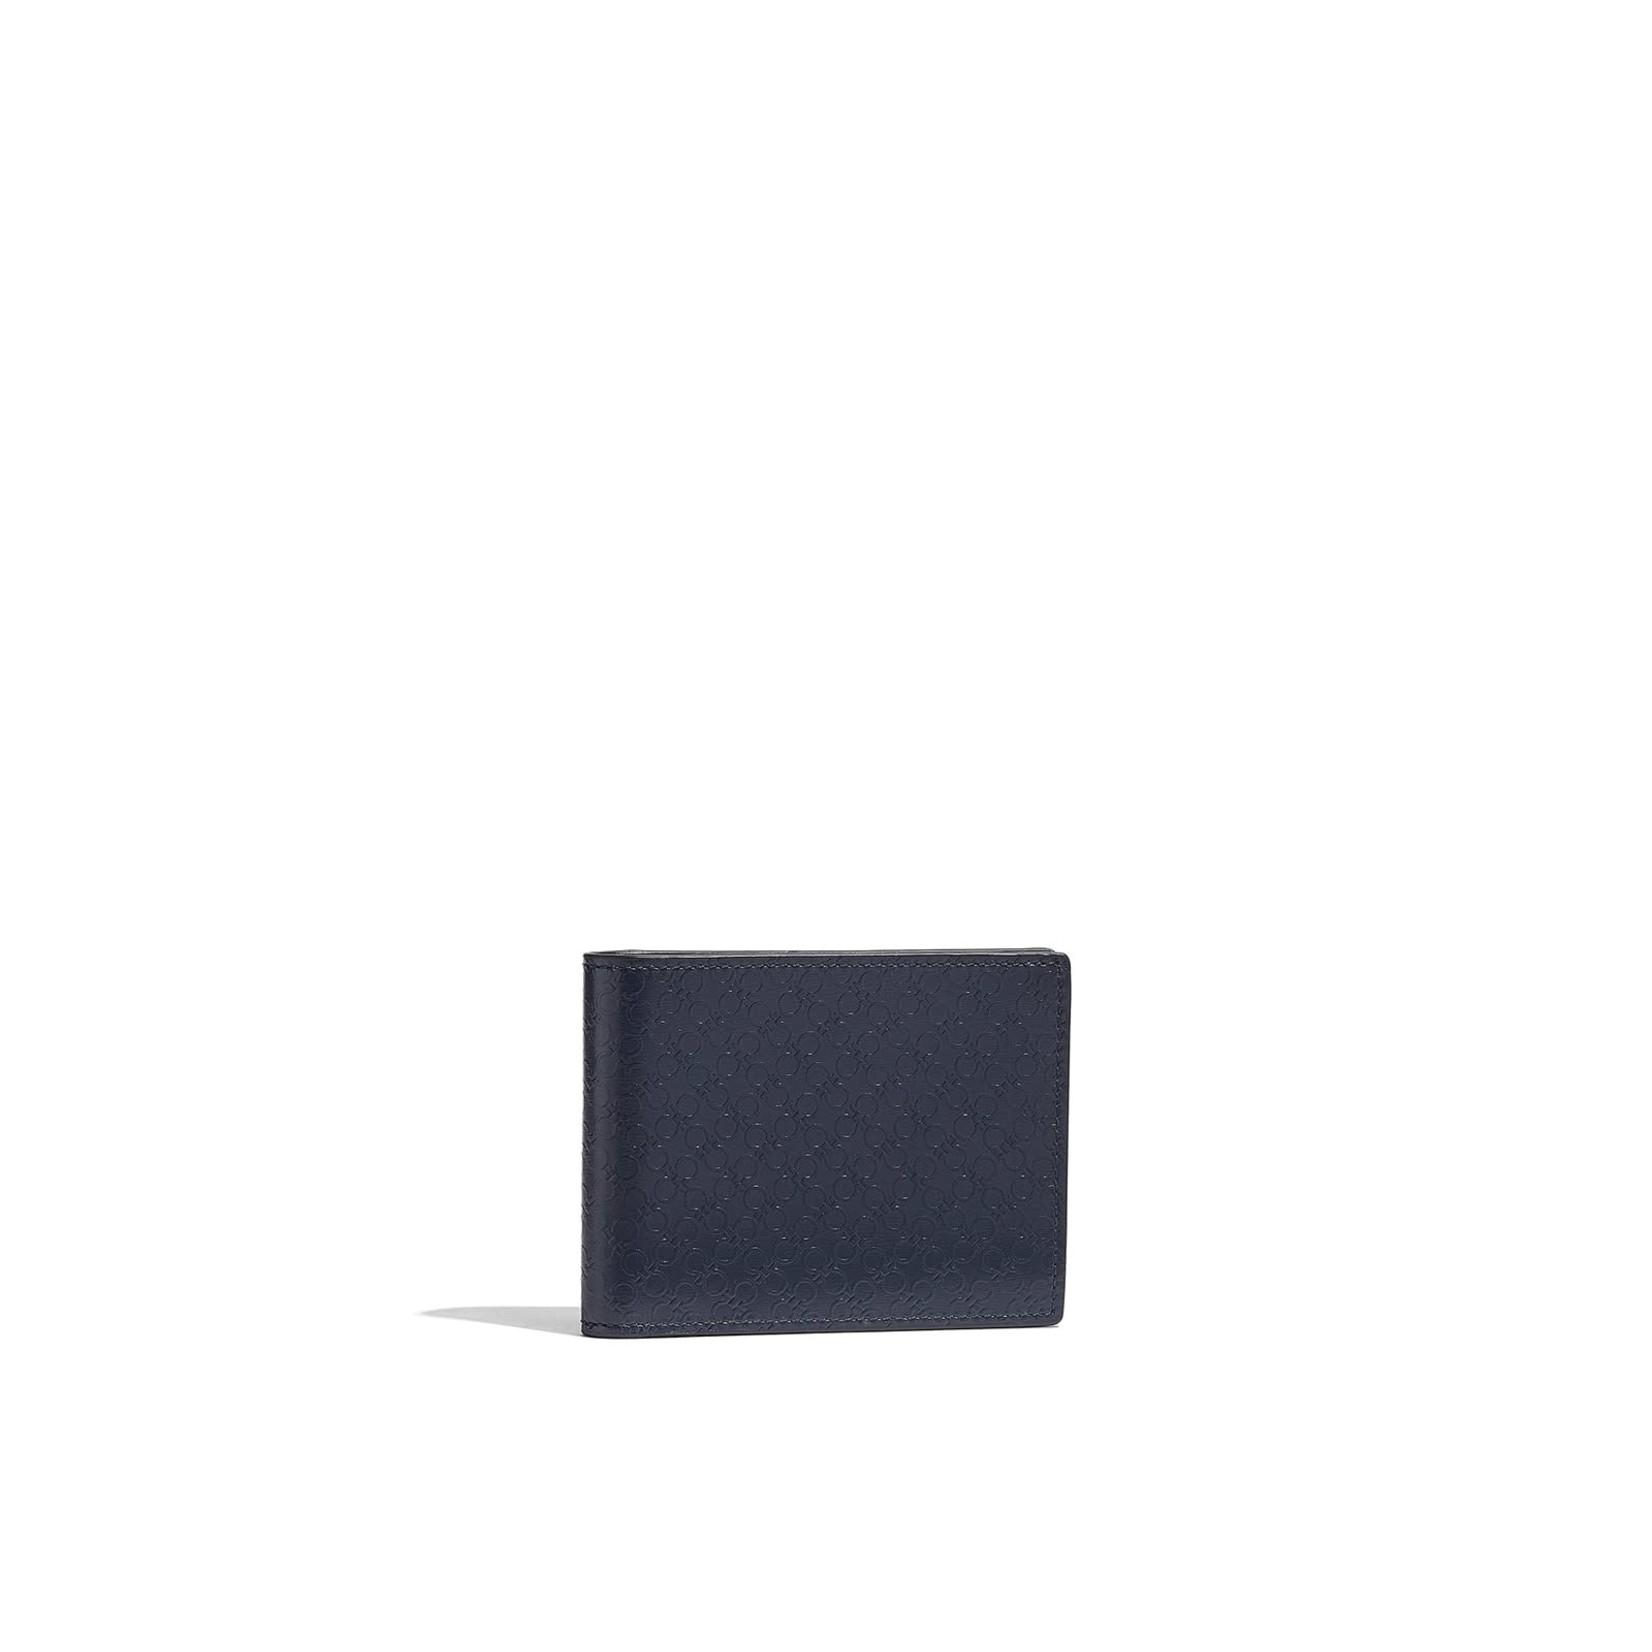 SALVATORE FERRAGAMO SALVATORE FERRAGAMO - CARD HOLDER - 686485